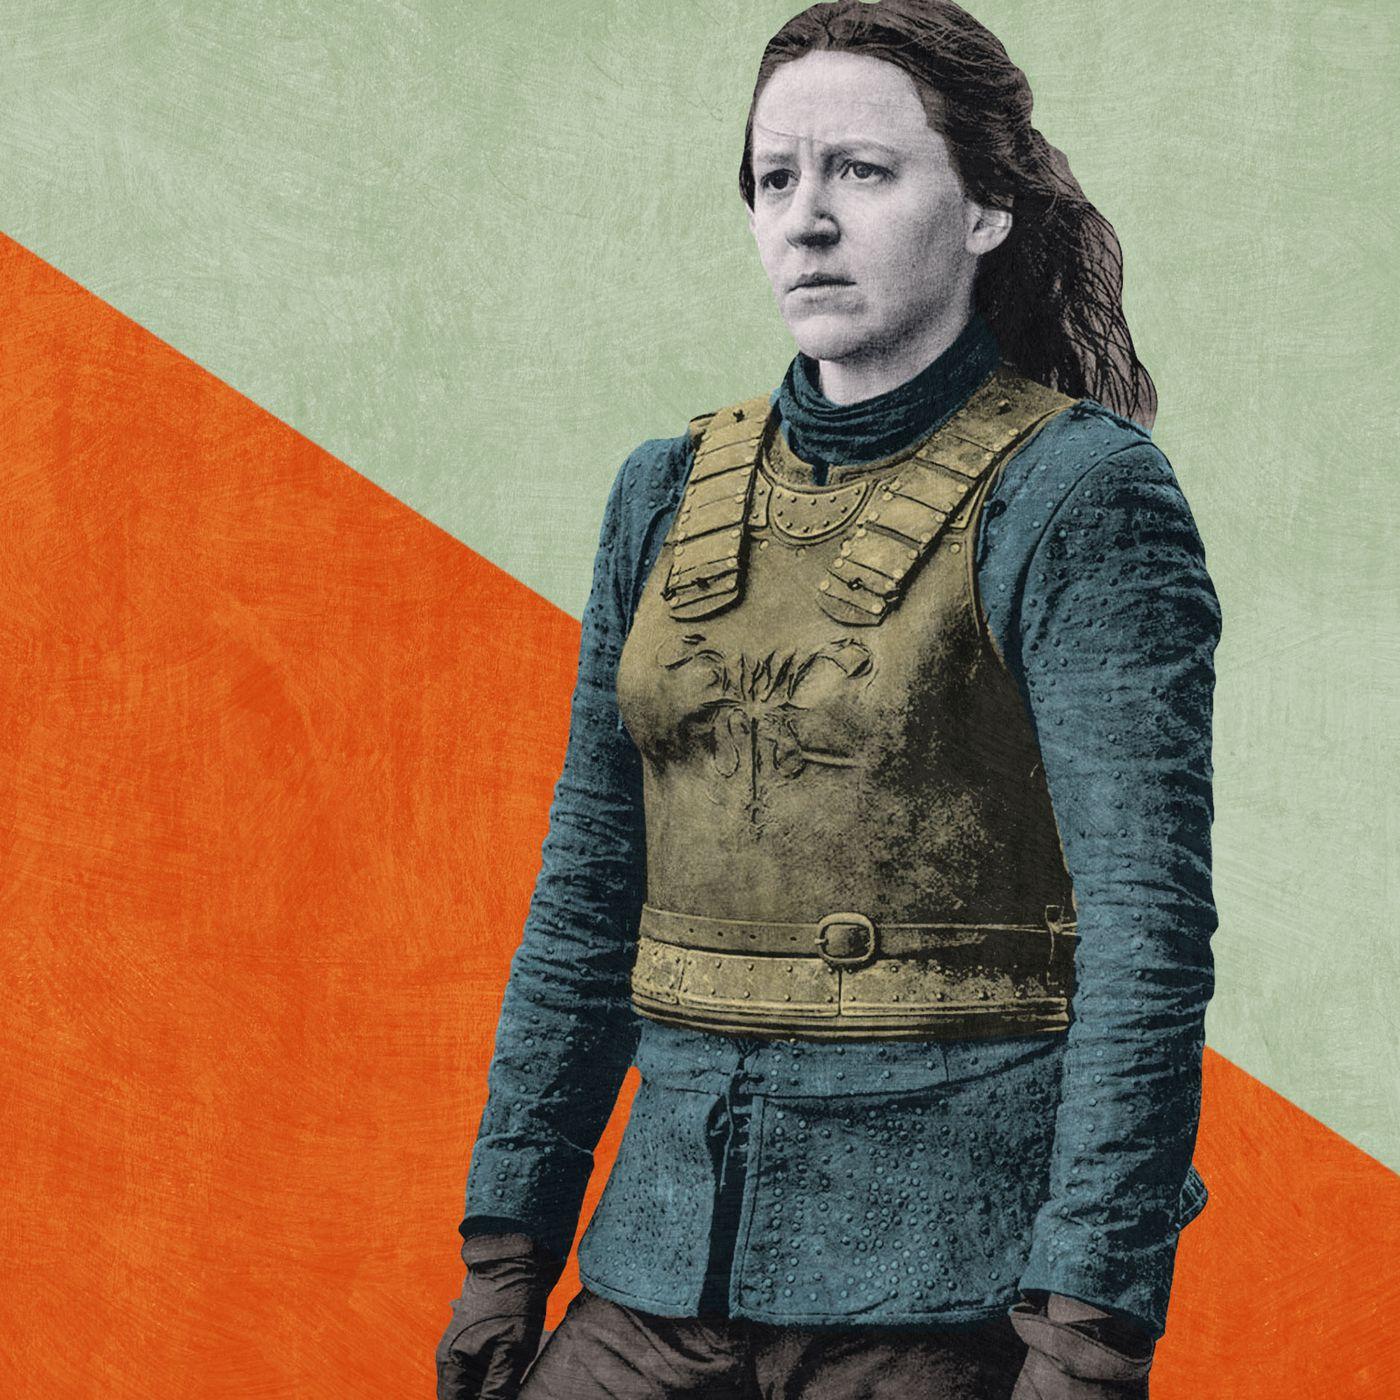 Game Of Thrones Season 8 Yara Greyjoy S Arc And Theon Greyjoy S Redemption The Ringer